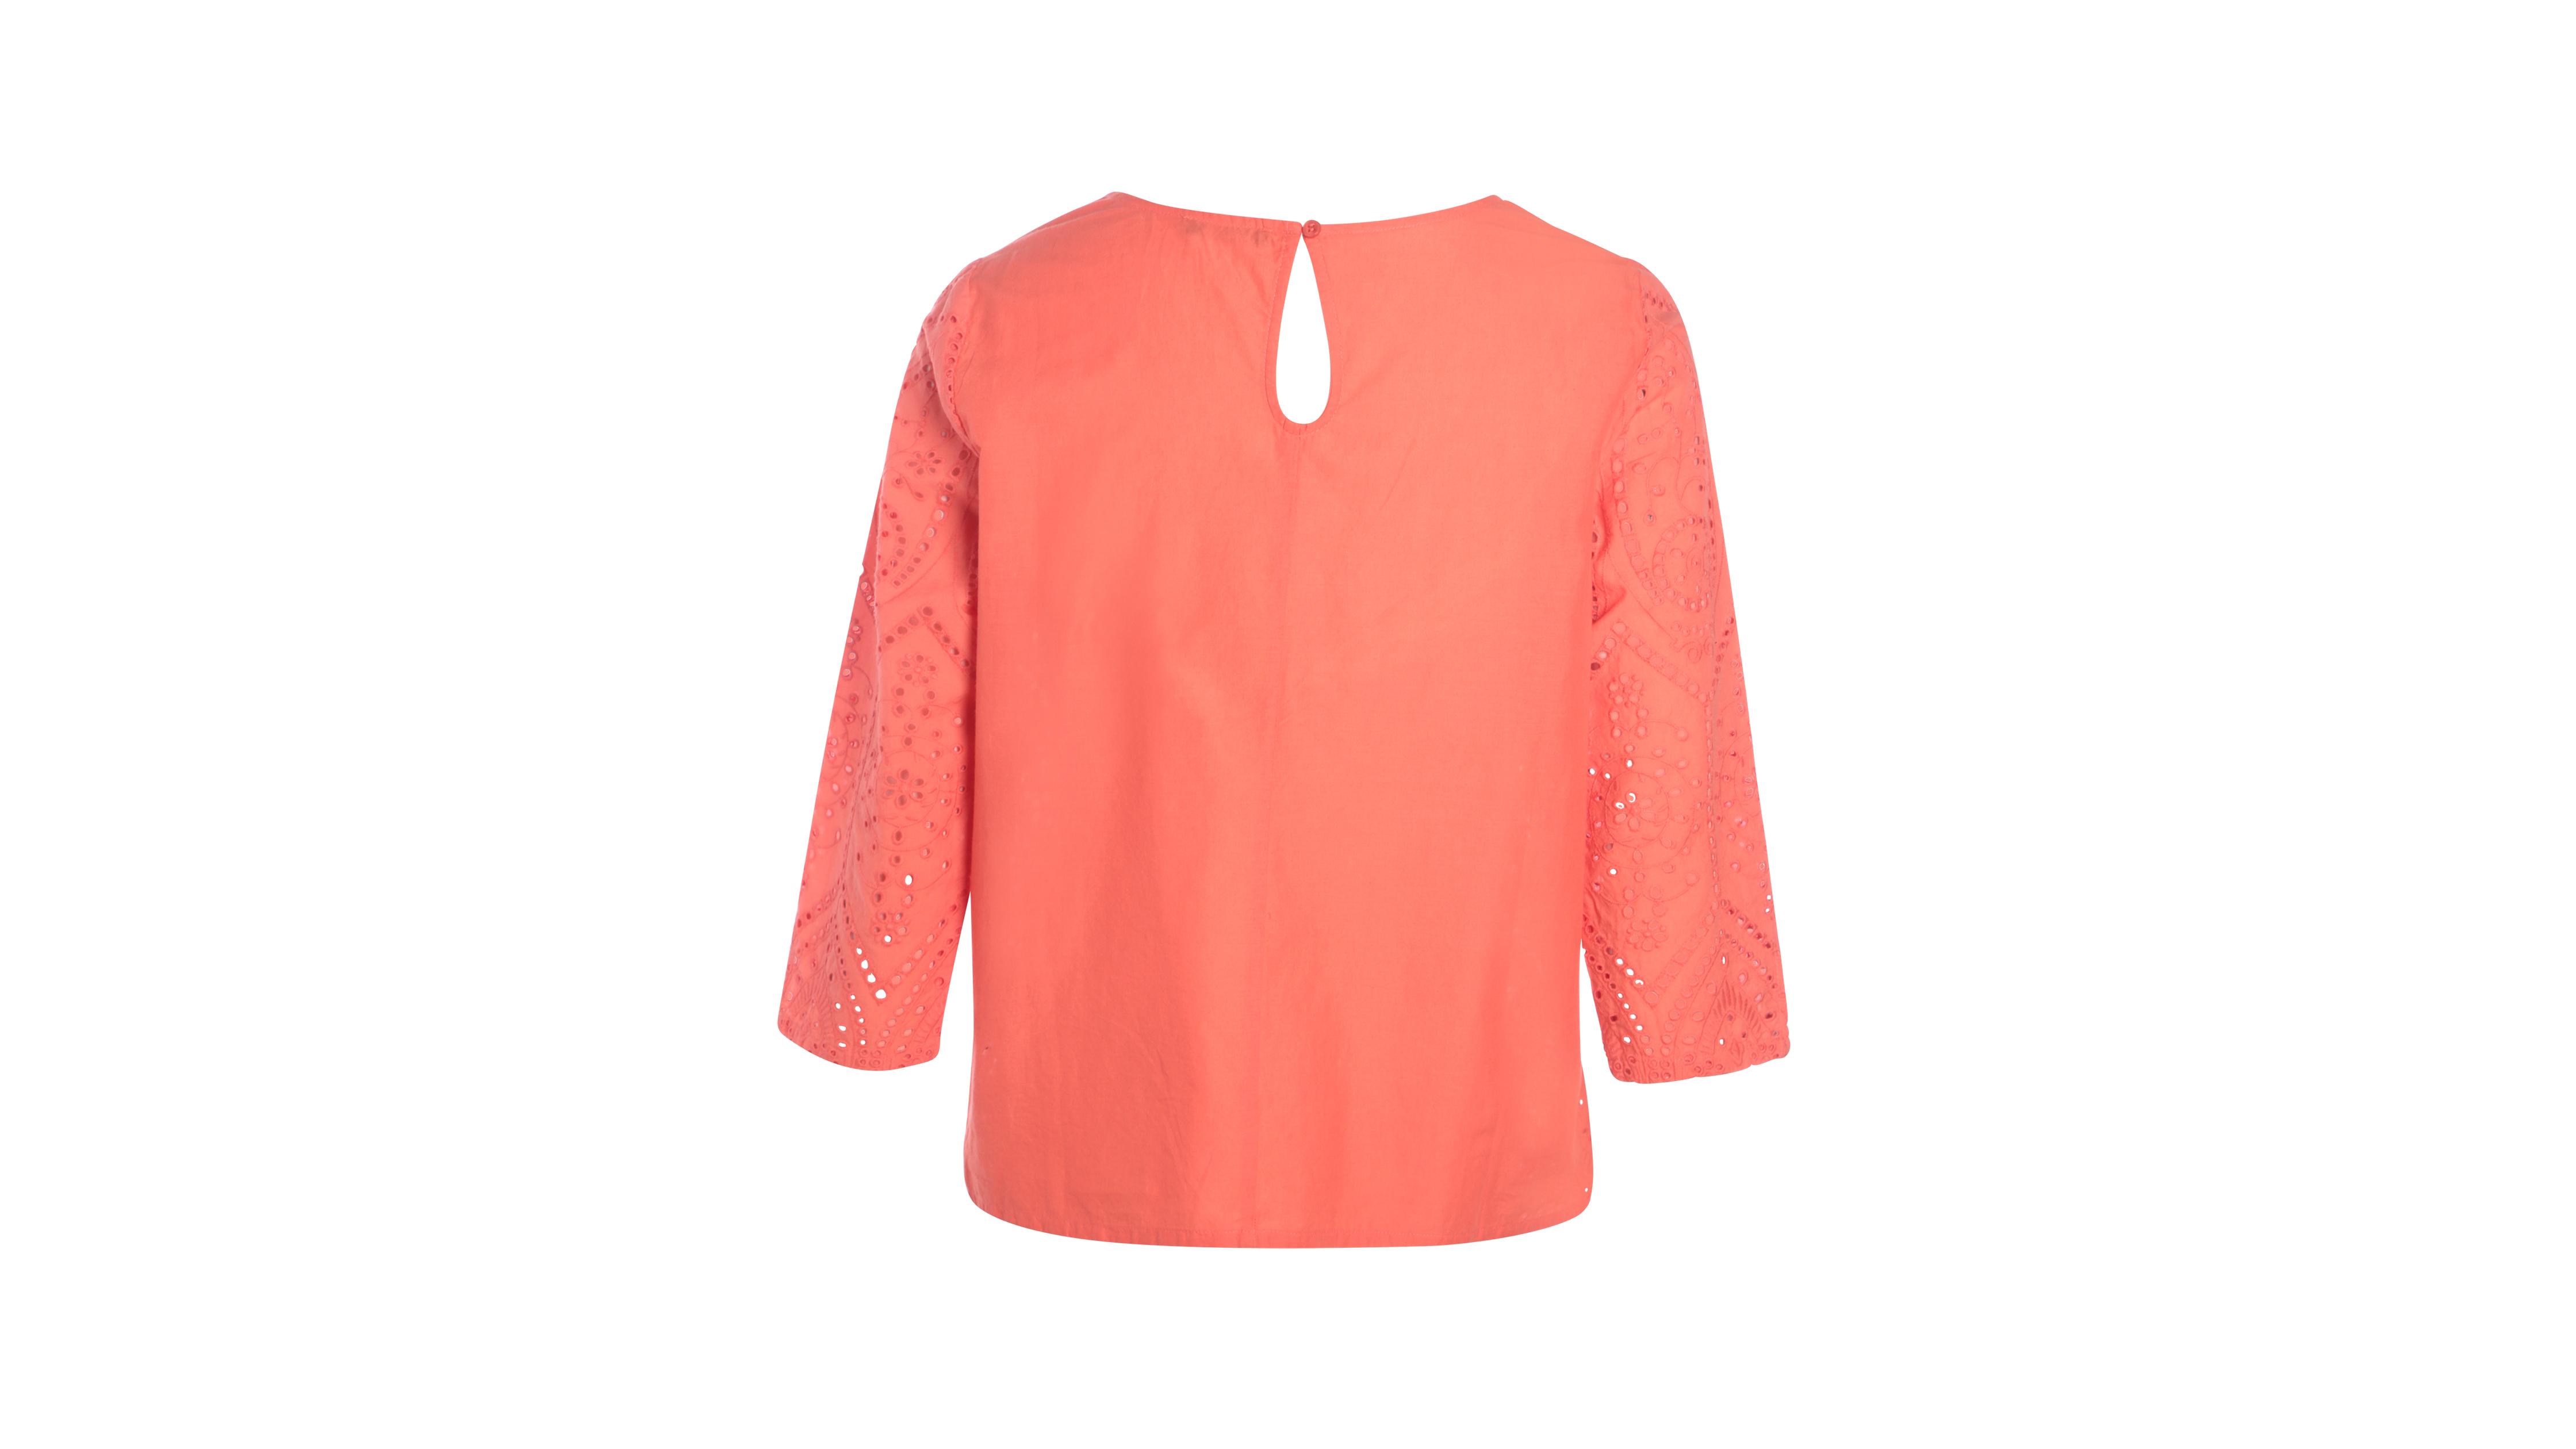 naranja coral bordada bordada Camisa Camisa YbfIygv76m